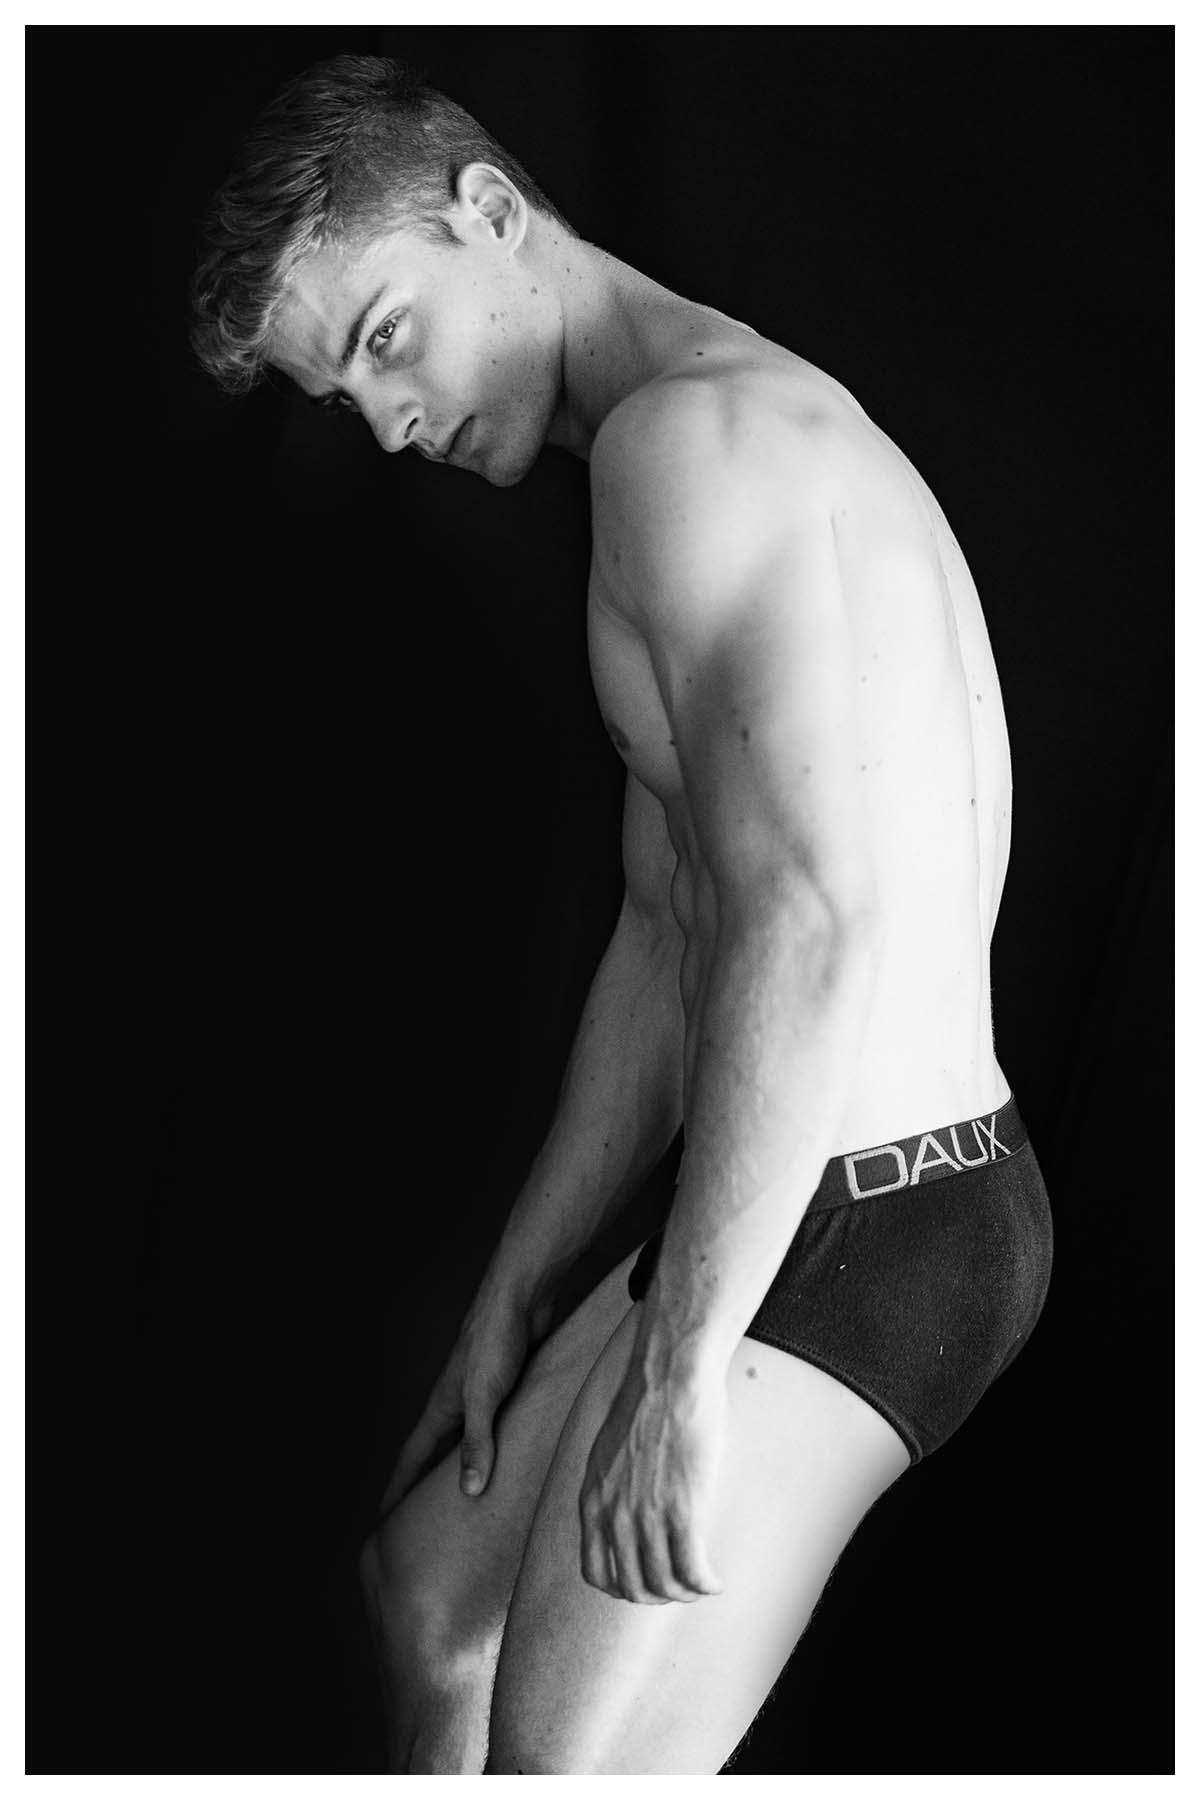 2018082103091177 - 金发帅气男模 Angelo Giacomini / Luis Ribeiro摄影作品